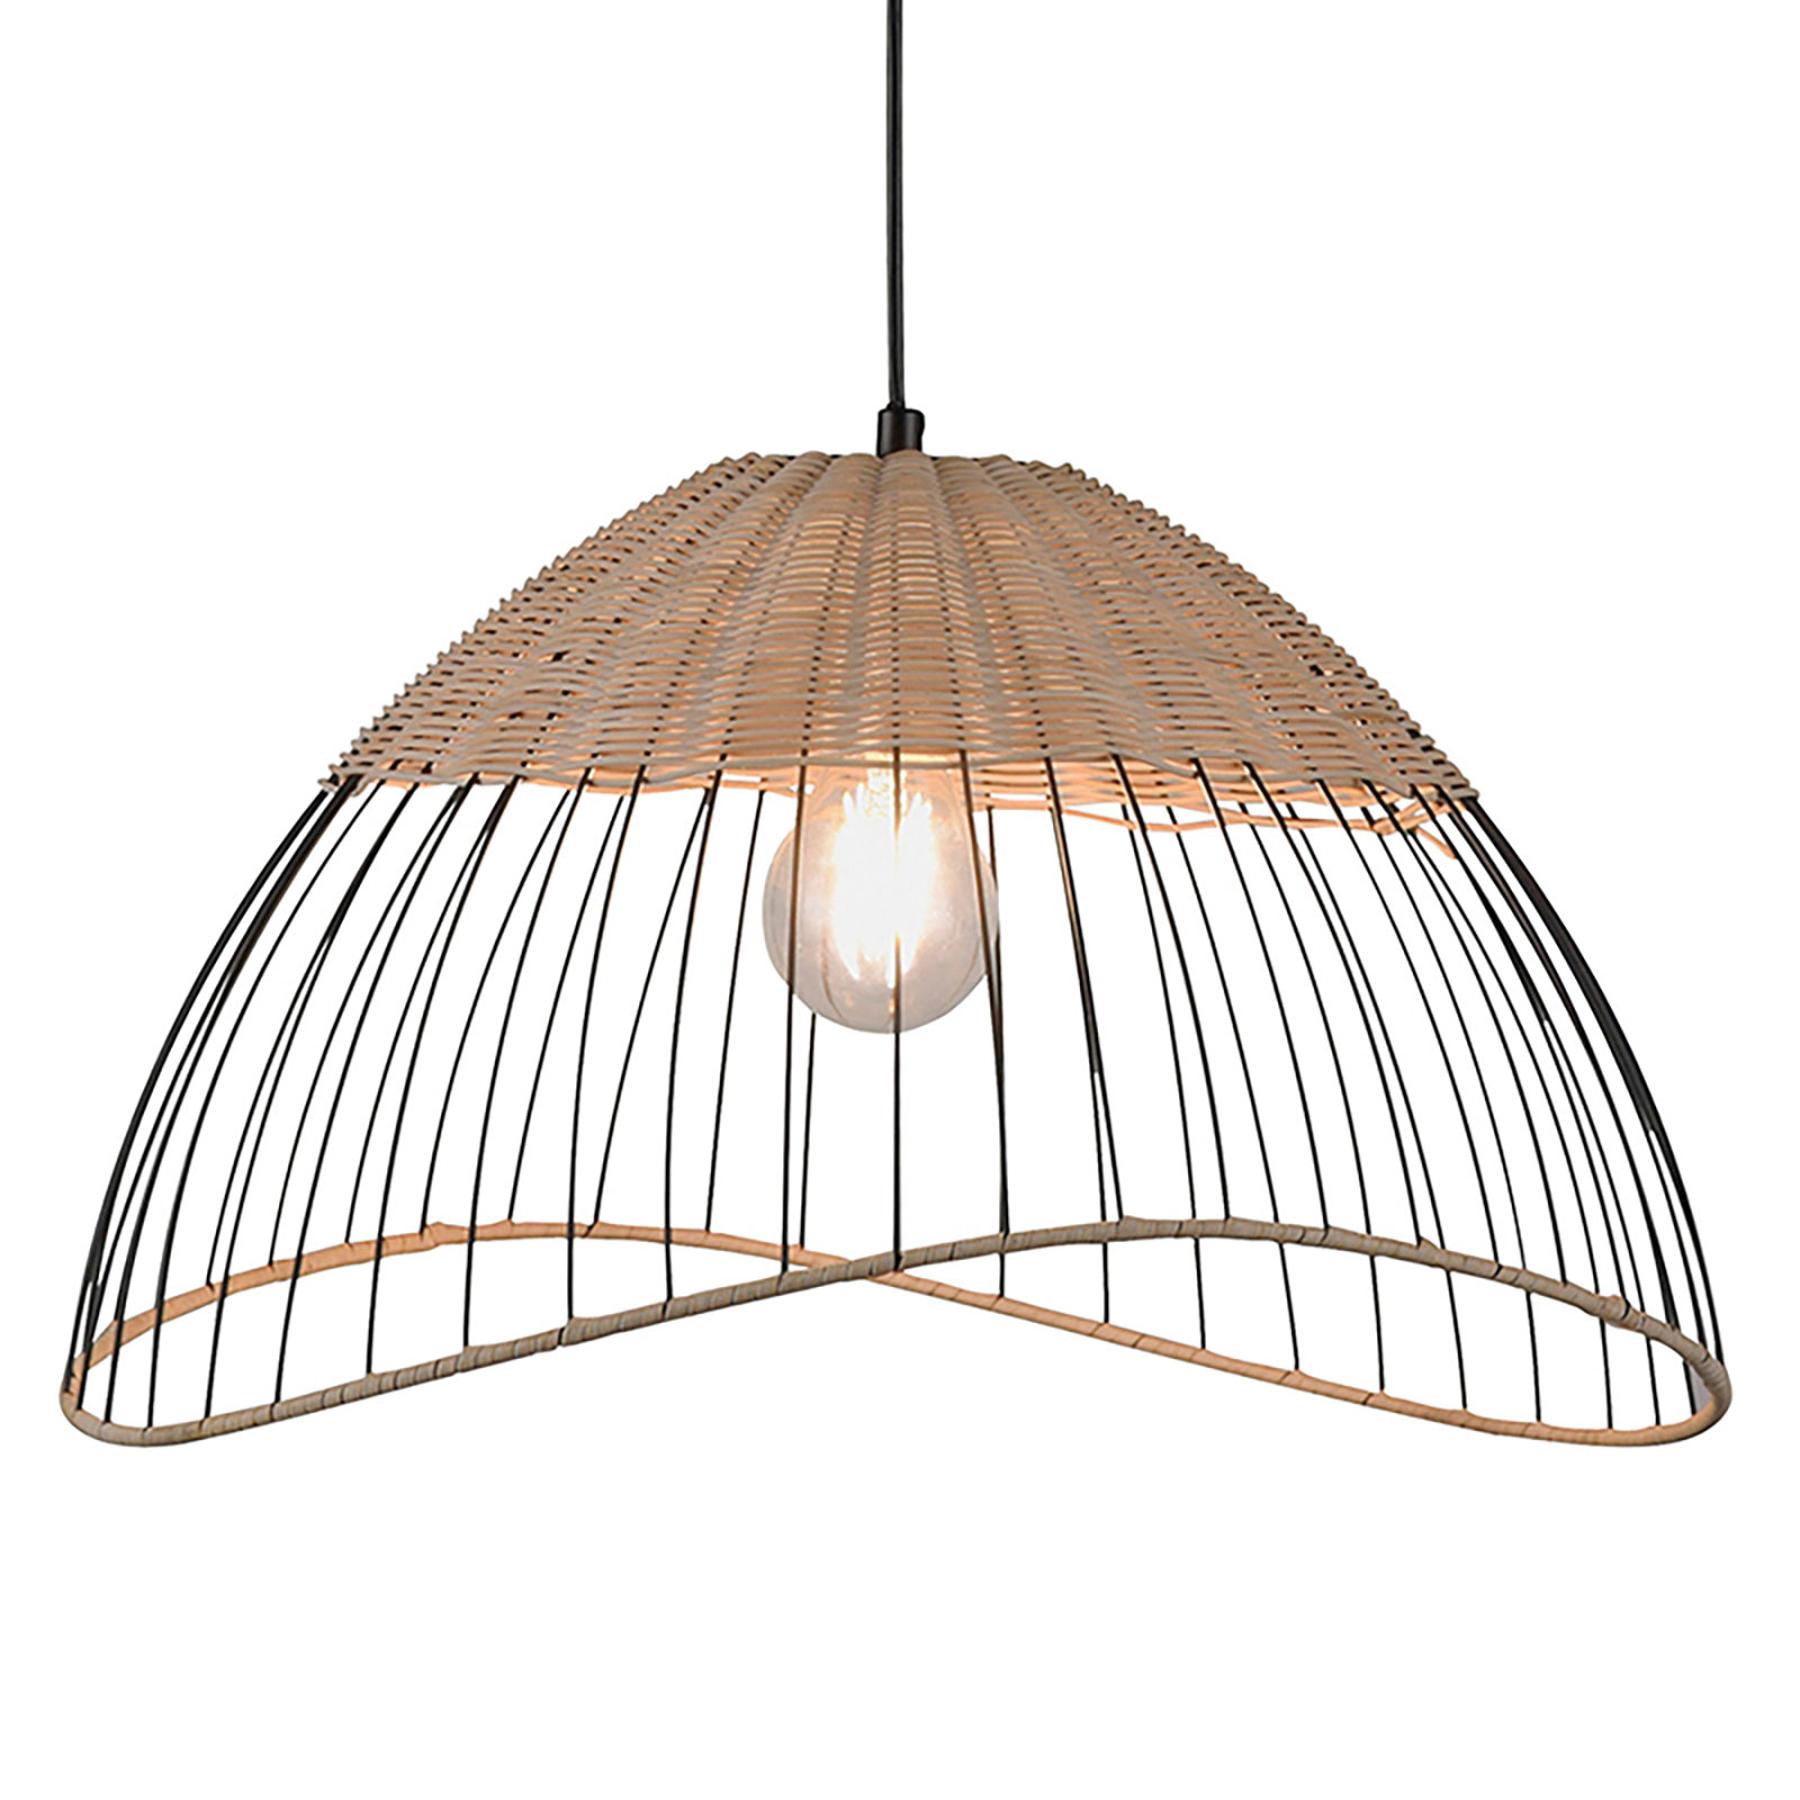 Hanglamp Reed met kap als halve bol